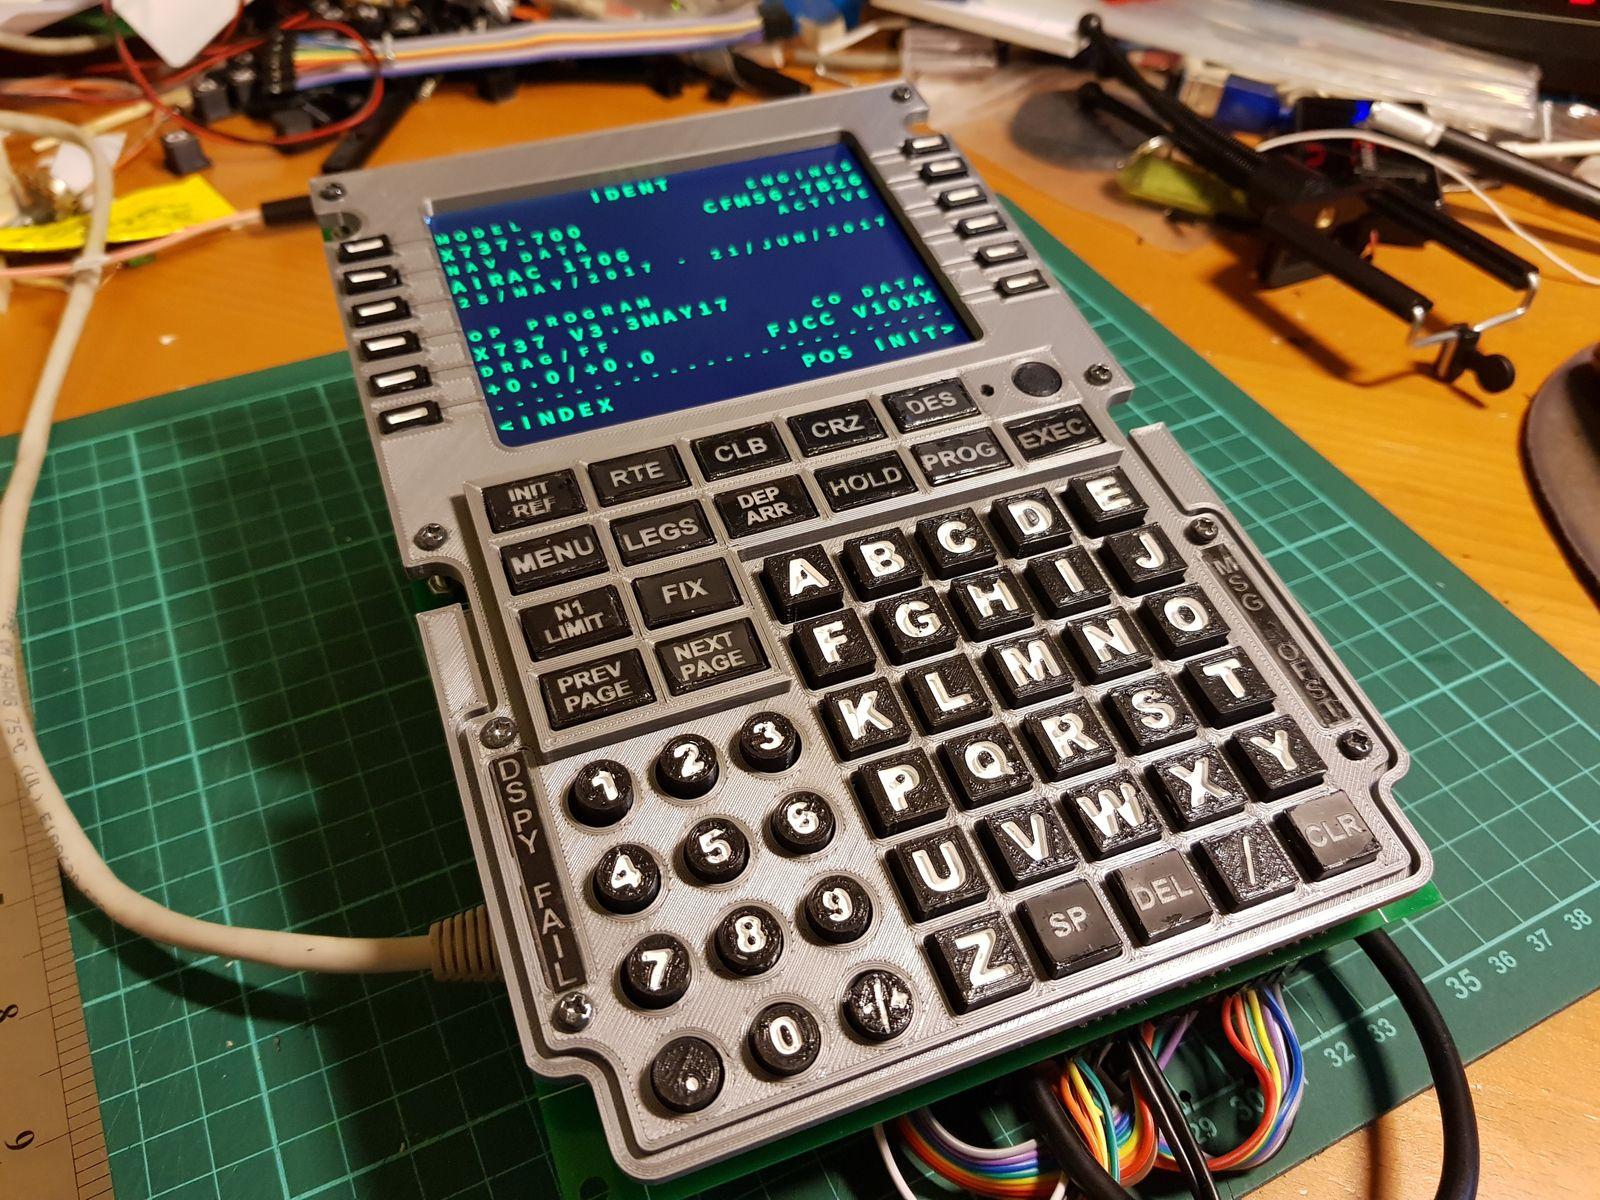 737 FMC CDU - Interfacing to a Raspberry Pi   Life, The Universe and